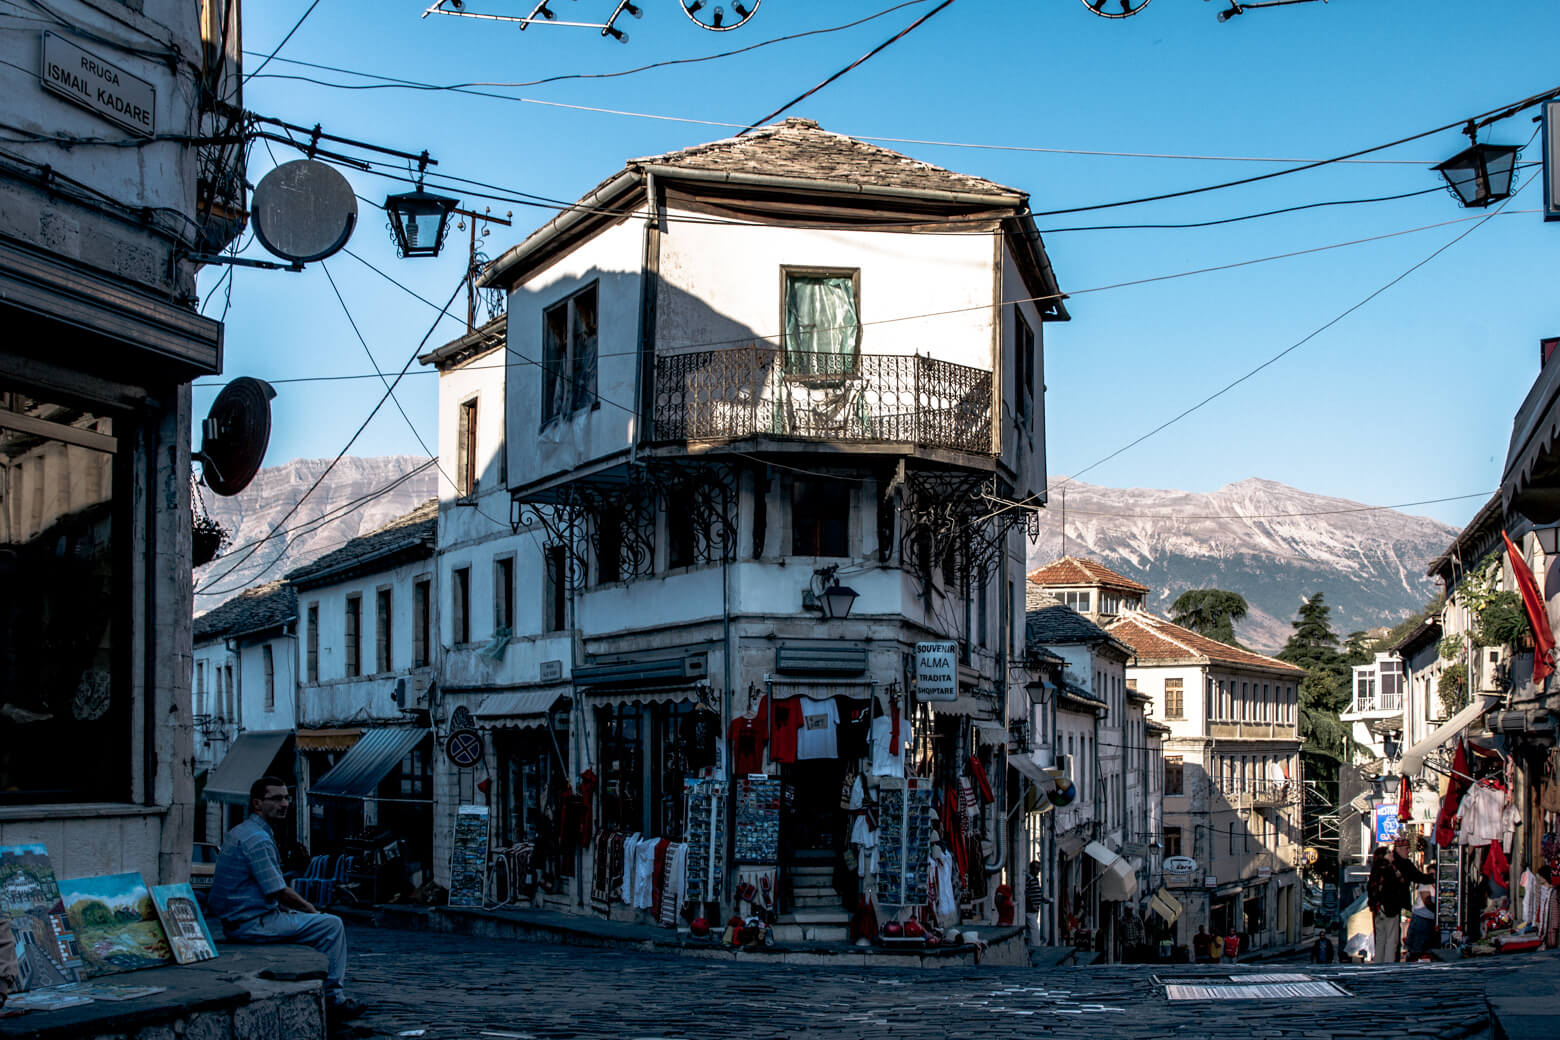 Улицы Гирокастры